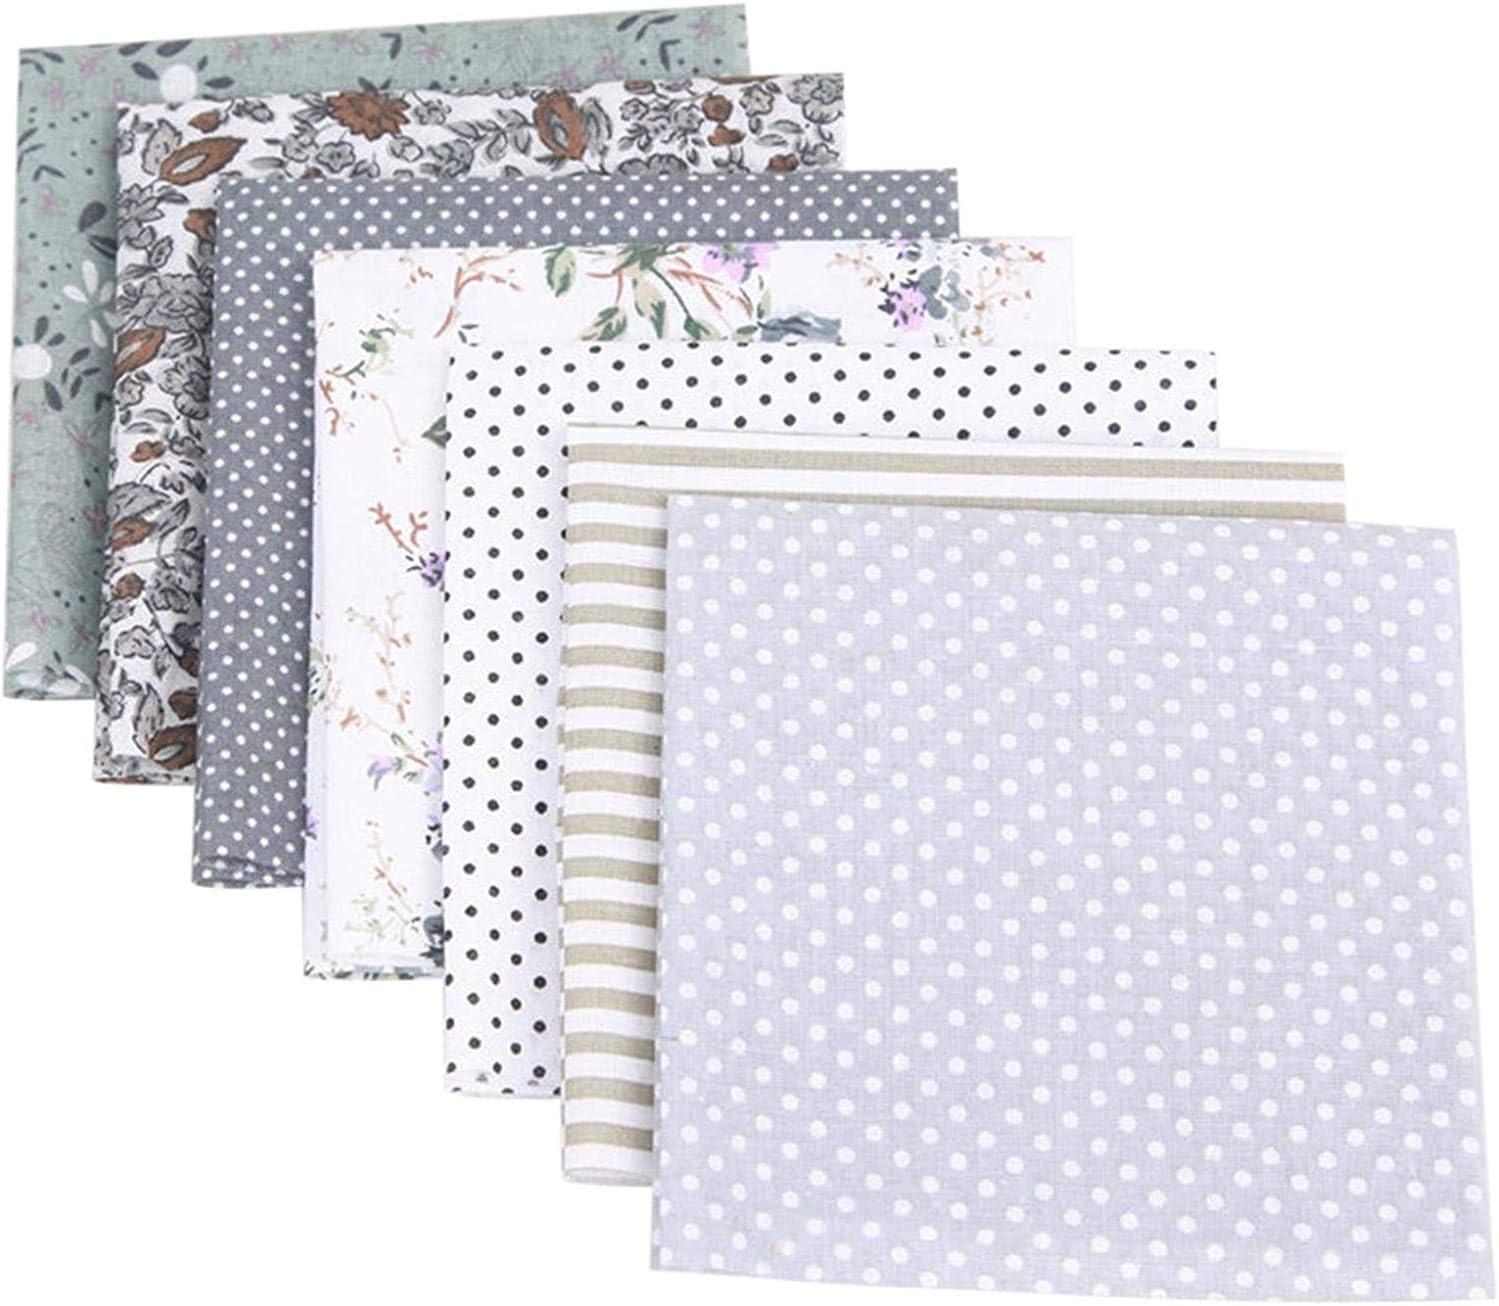 Cotton Craft Fabric Bundle Patchwork, 7pcs 19.6'' Cotton Fabric Squares Quilting Sewing Patchwork Different Pattern Cloths DIY Scrapbooking Artcraft (Gray)